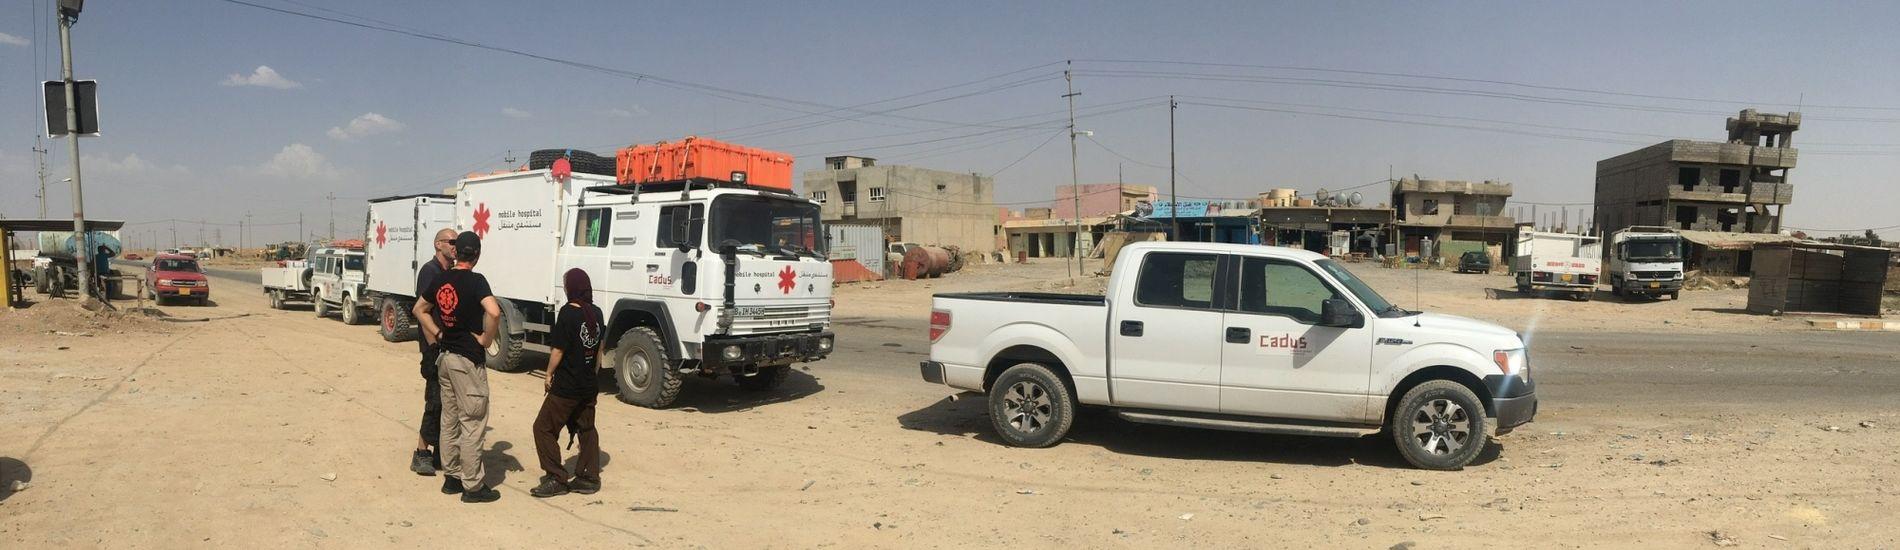 SonoSite in Iraq